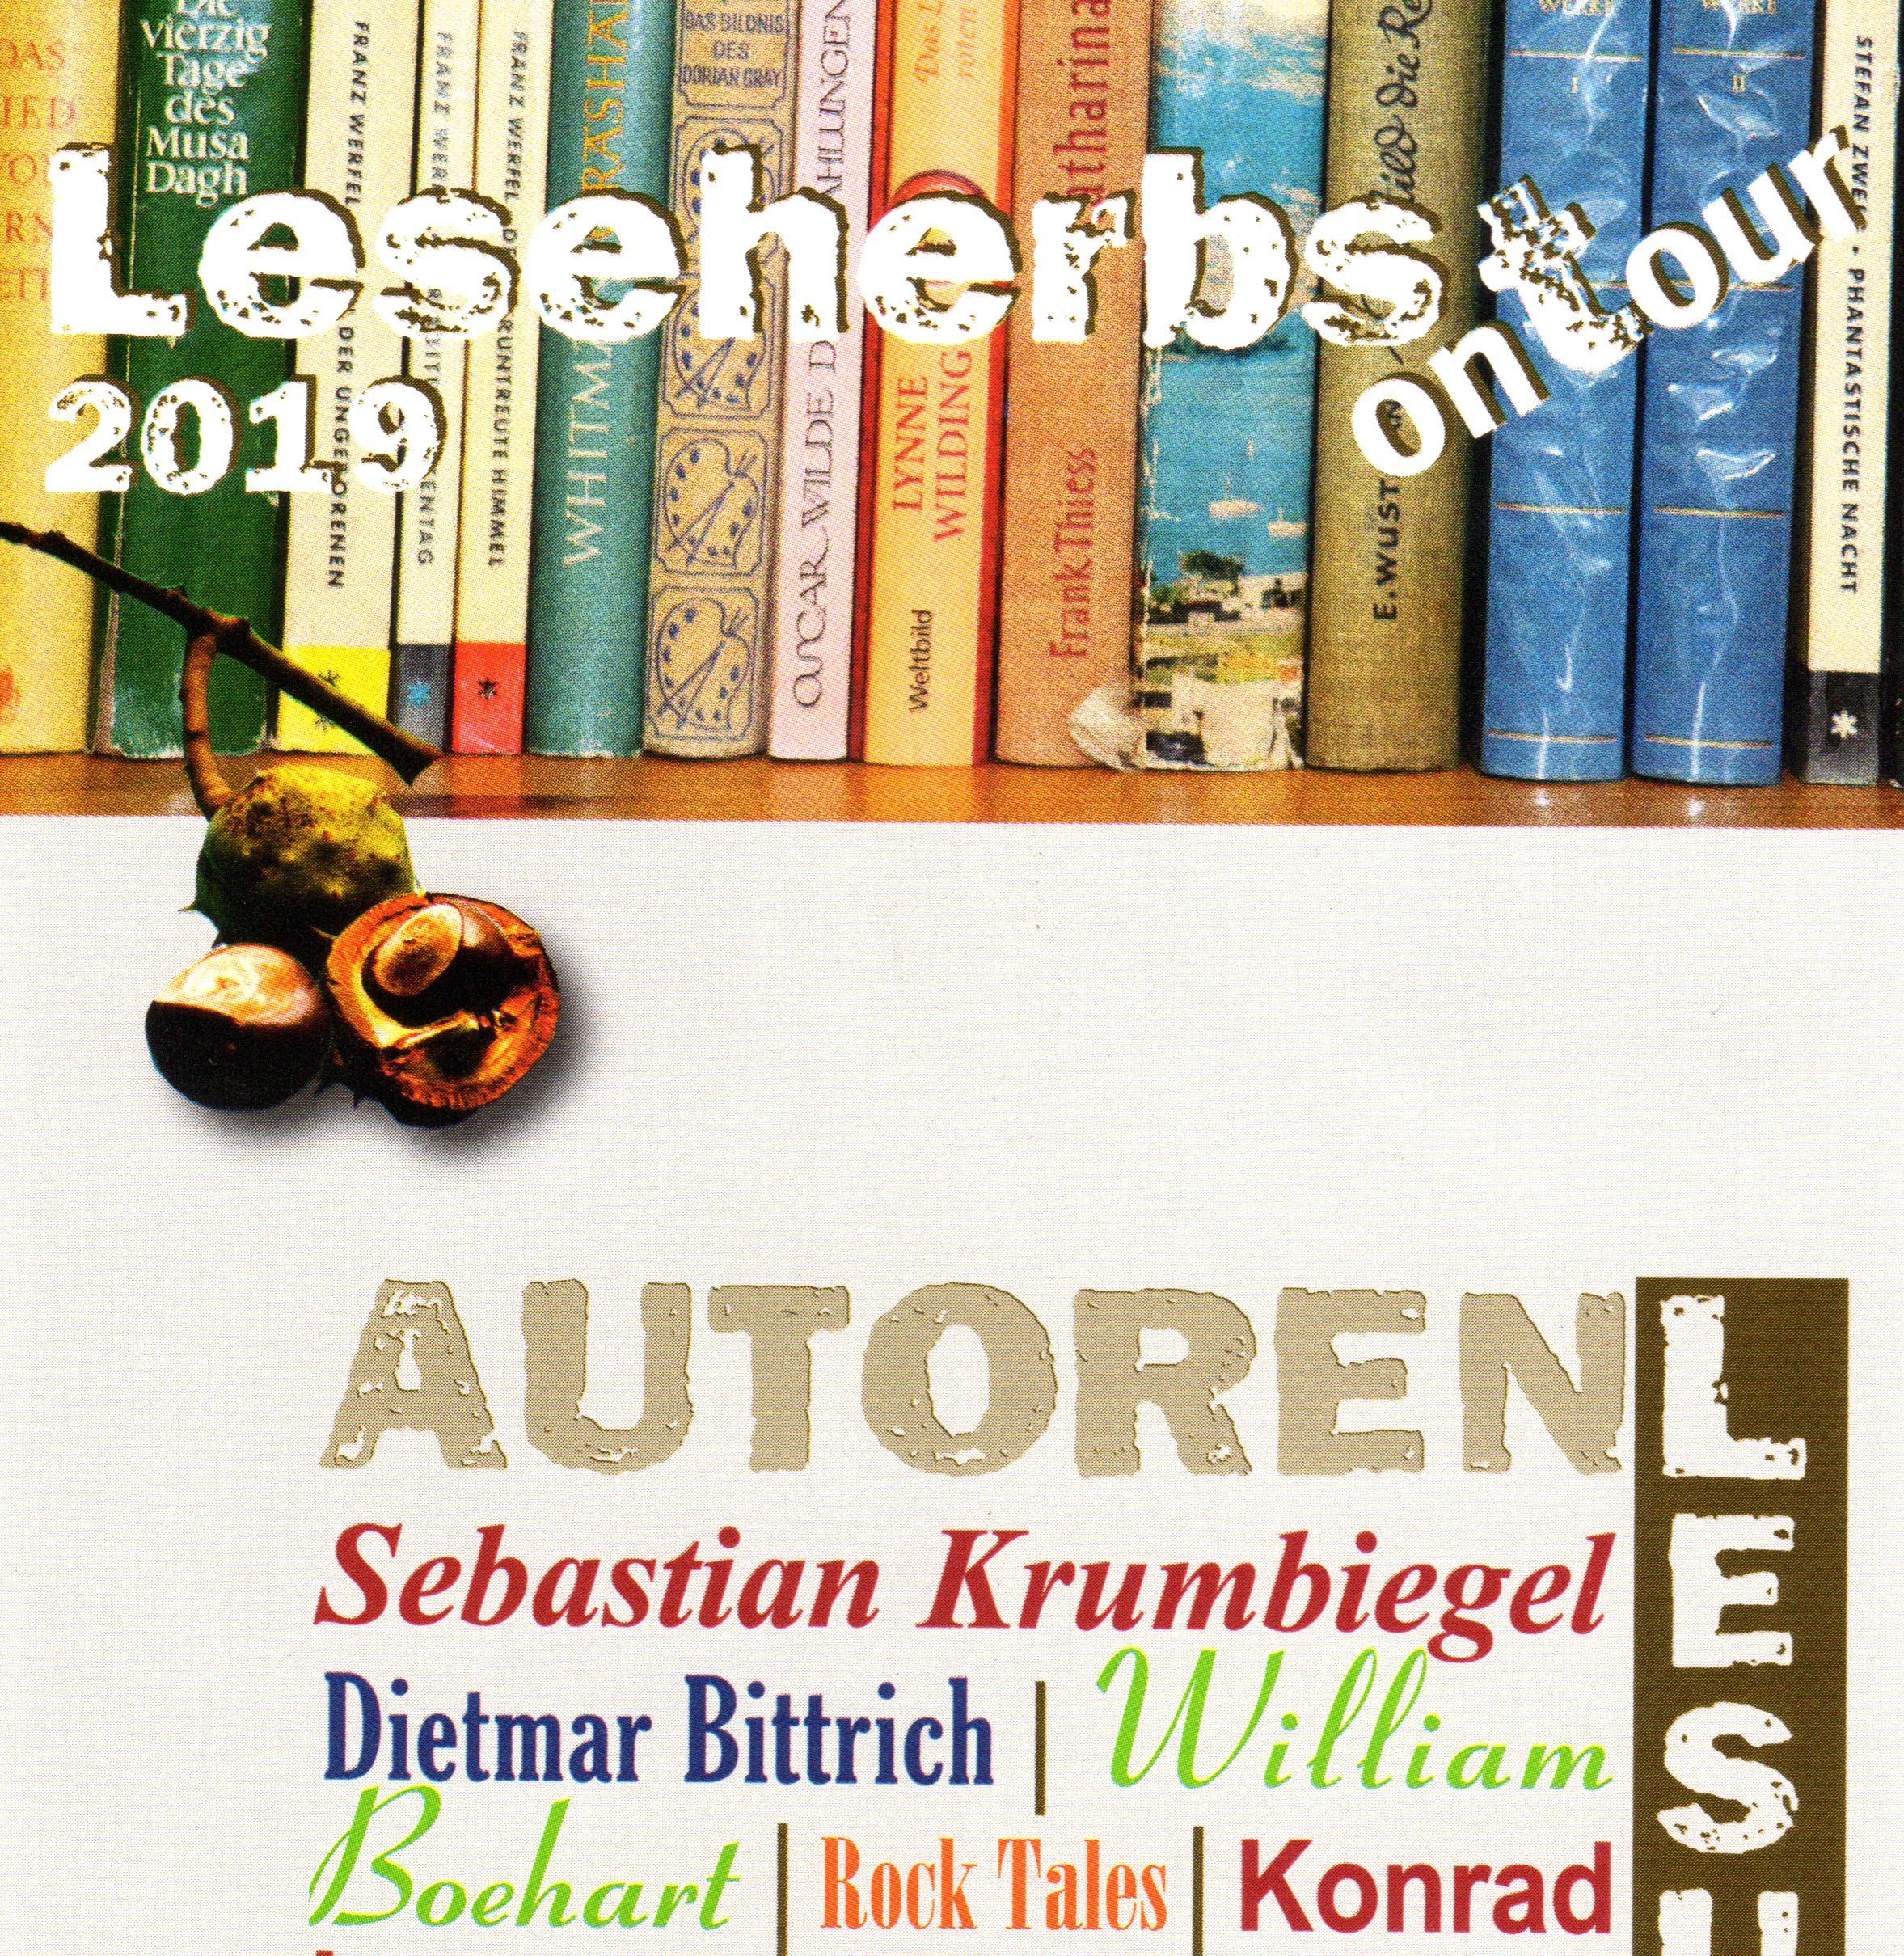 "Leseherbst On Tour 2019 – Sebastian Krumbiegel ""Courage Zeigen"""